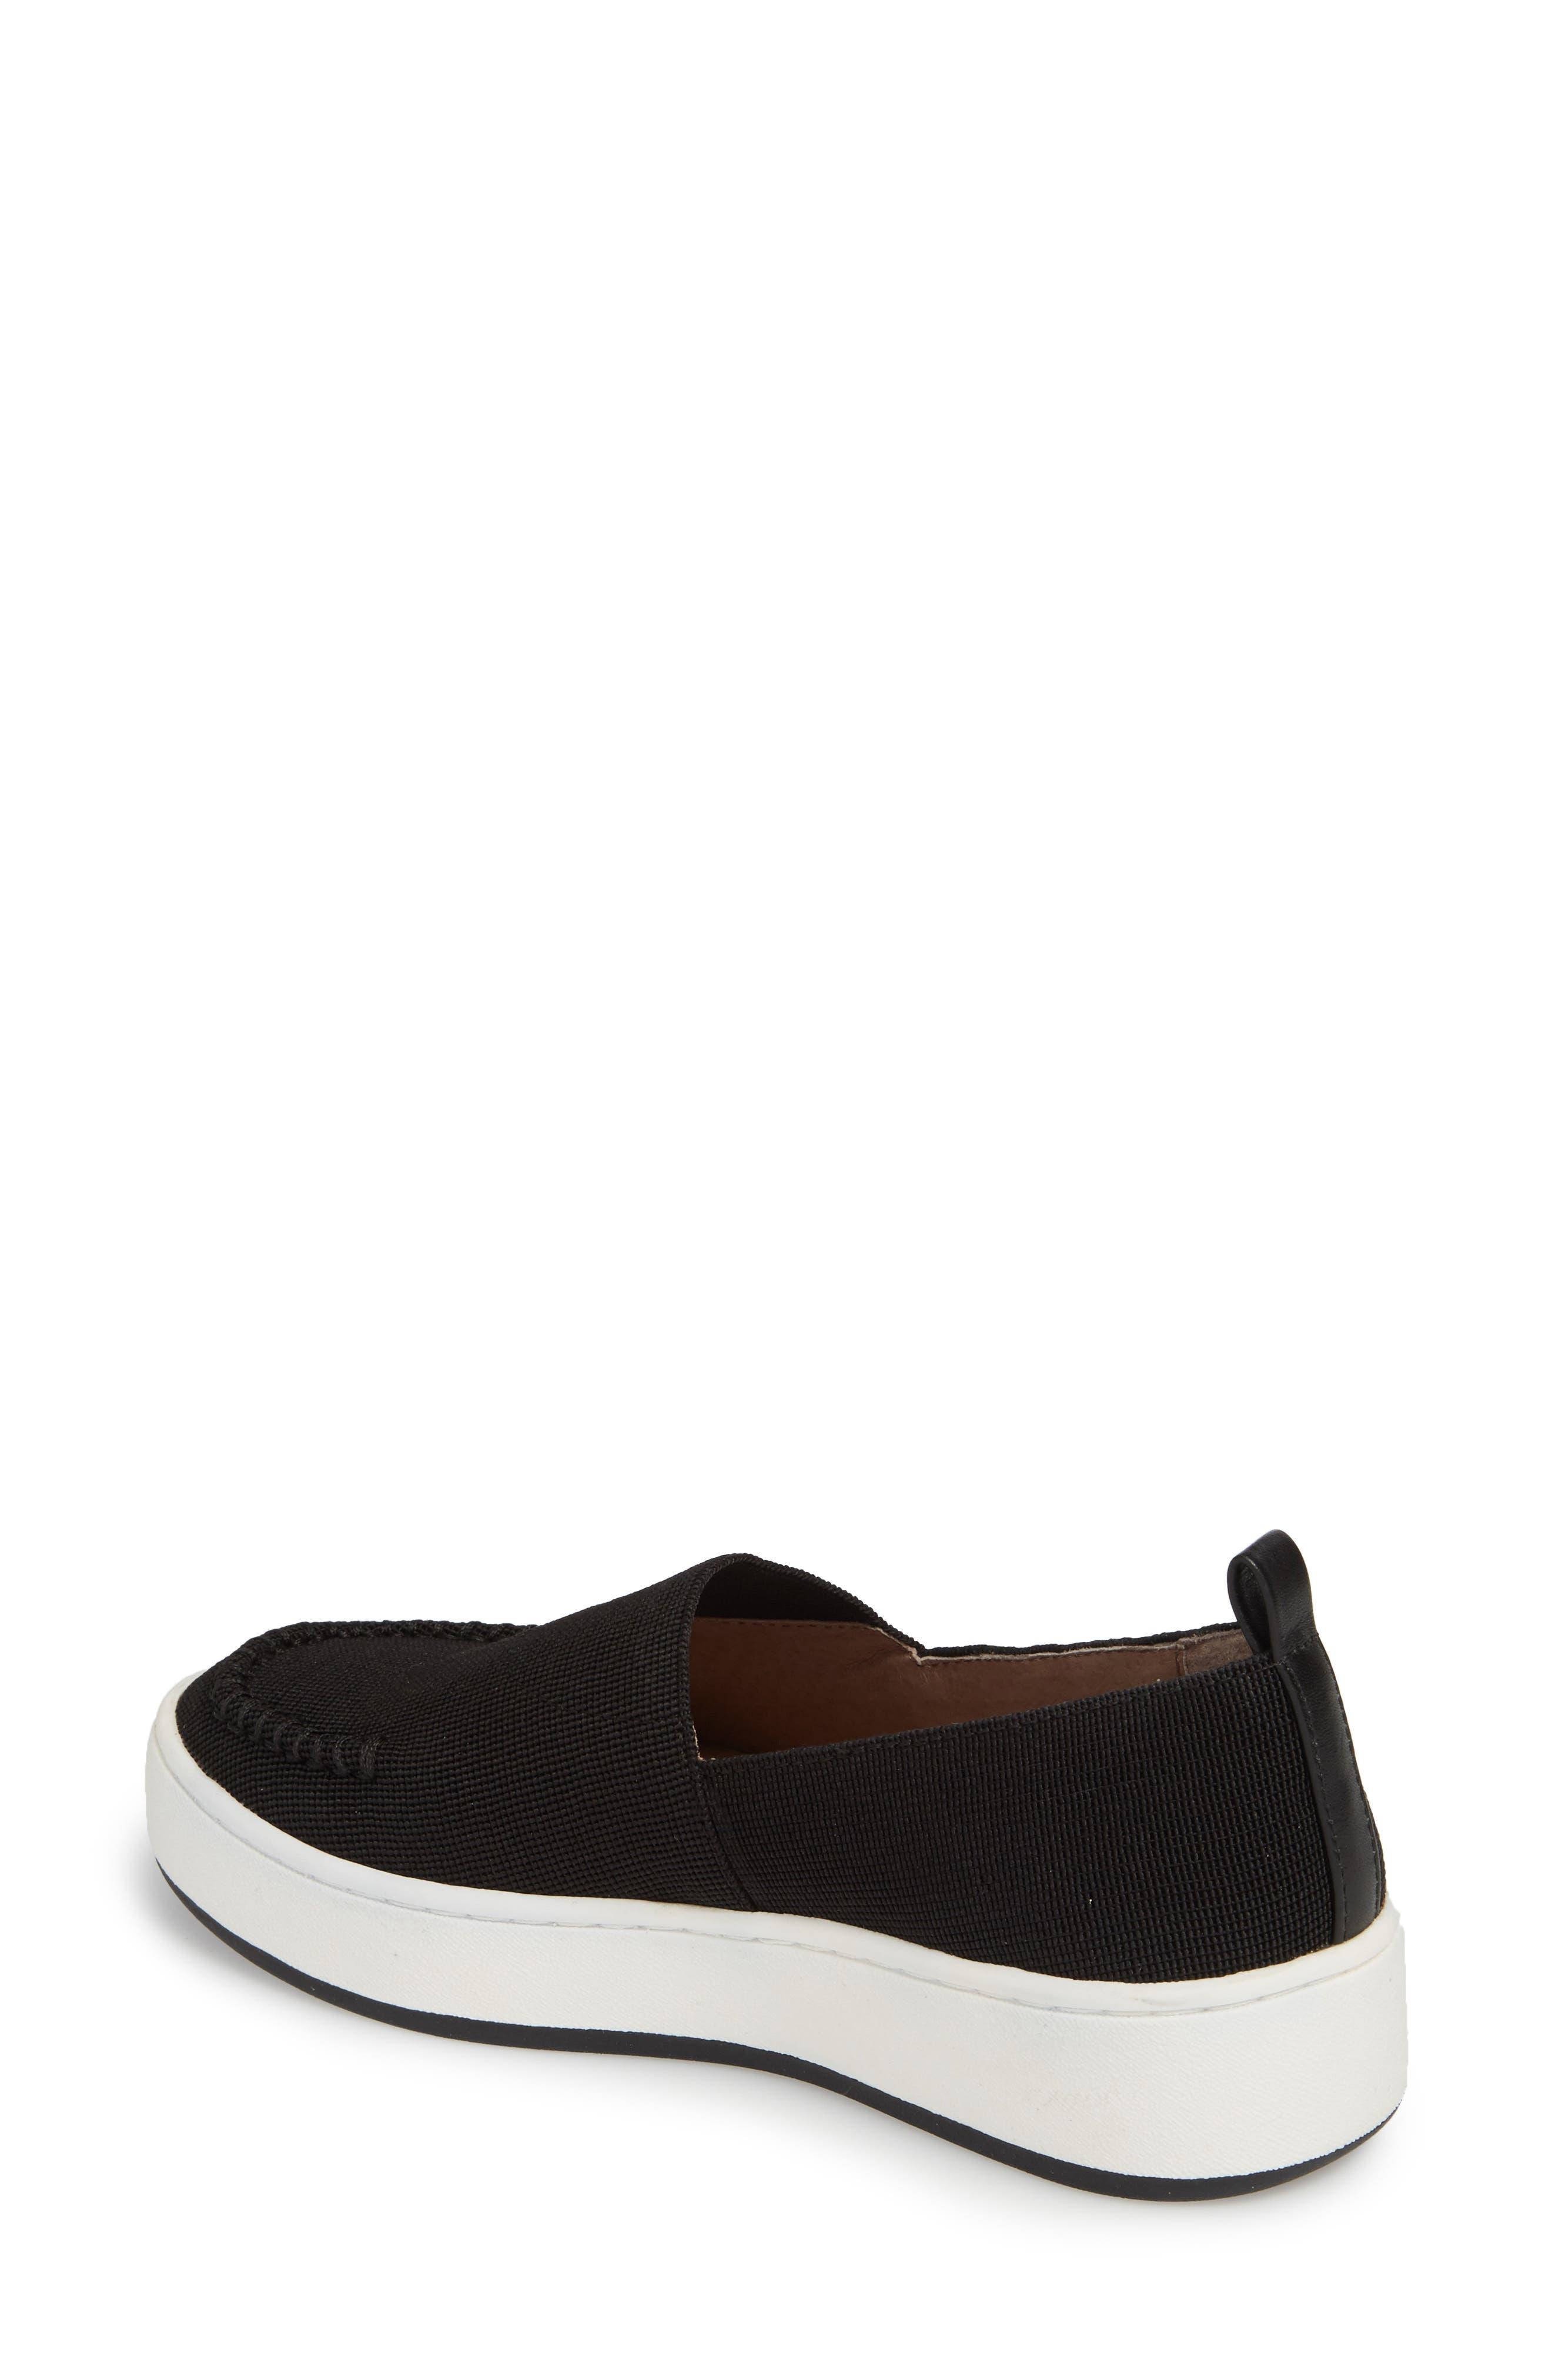 Cory Slip-On Sneaker,                             Alternate thumbnail 2, color,                             Black Elastic Fabric